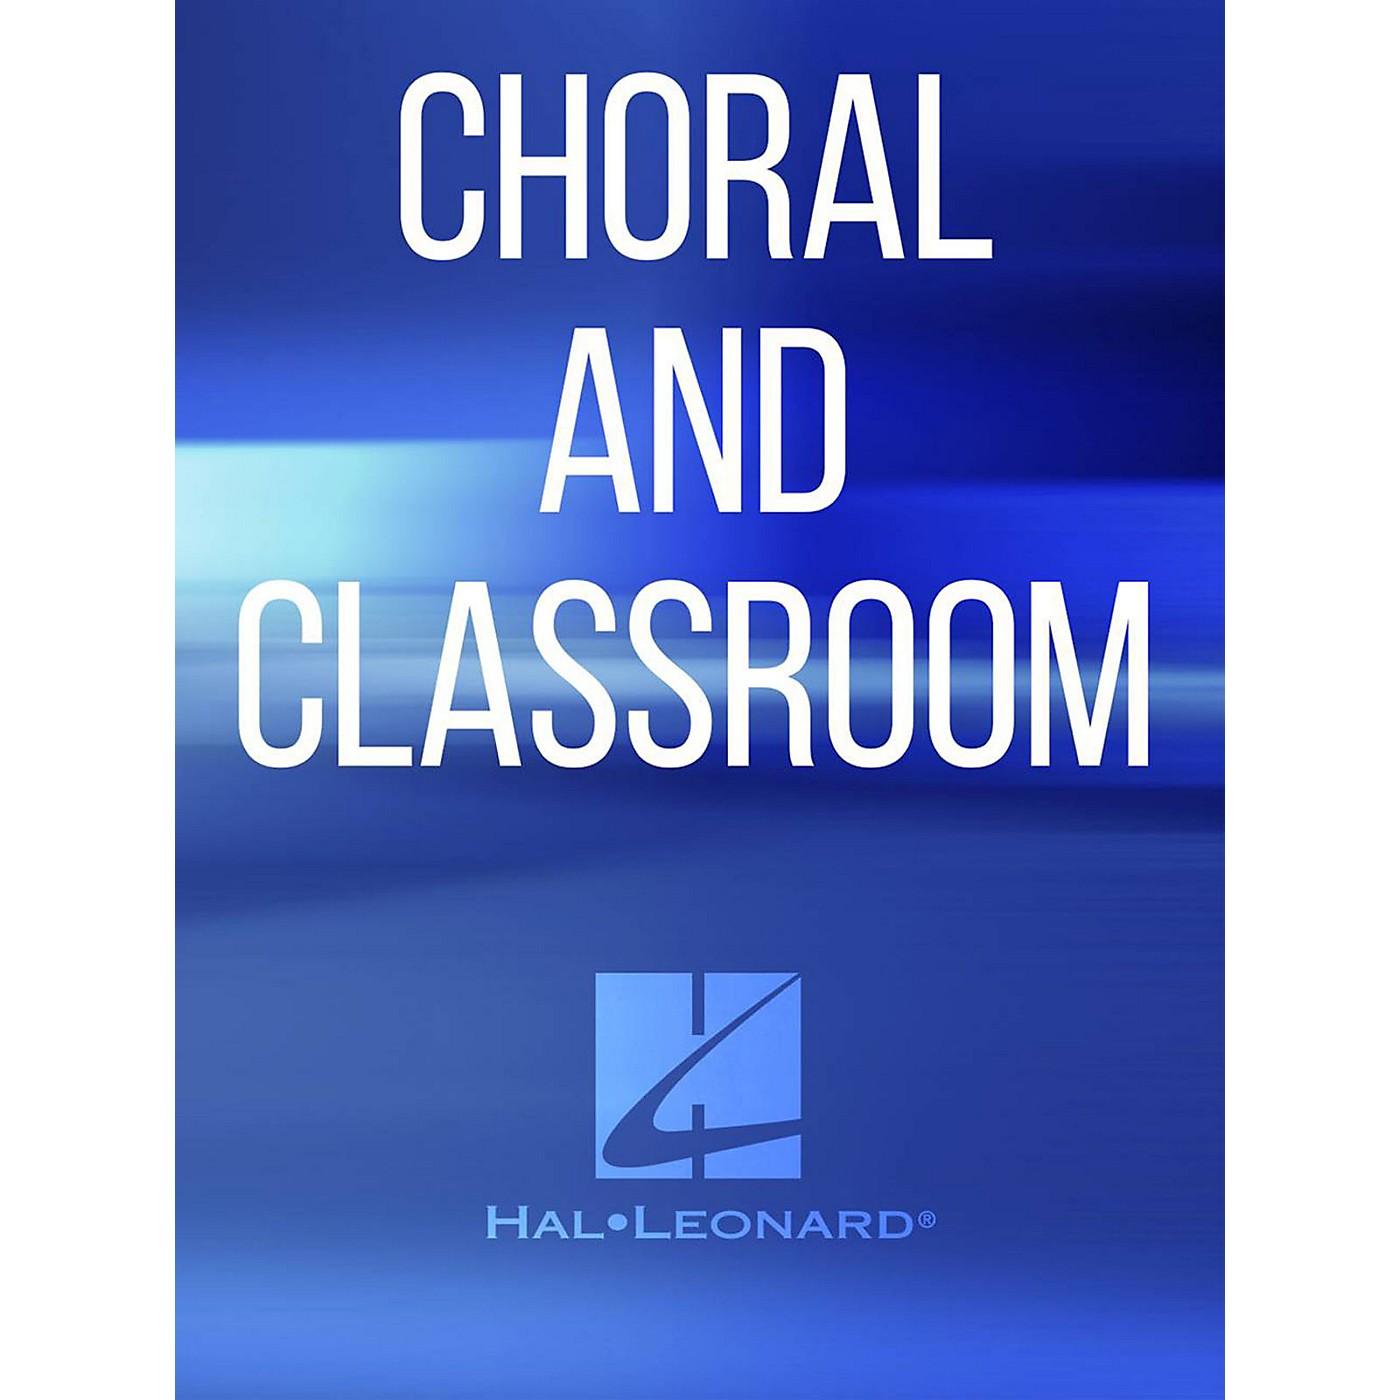 Hal Leonard Schon Blumelein Composed by William Hall thumbnail